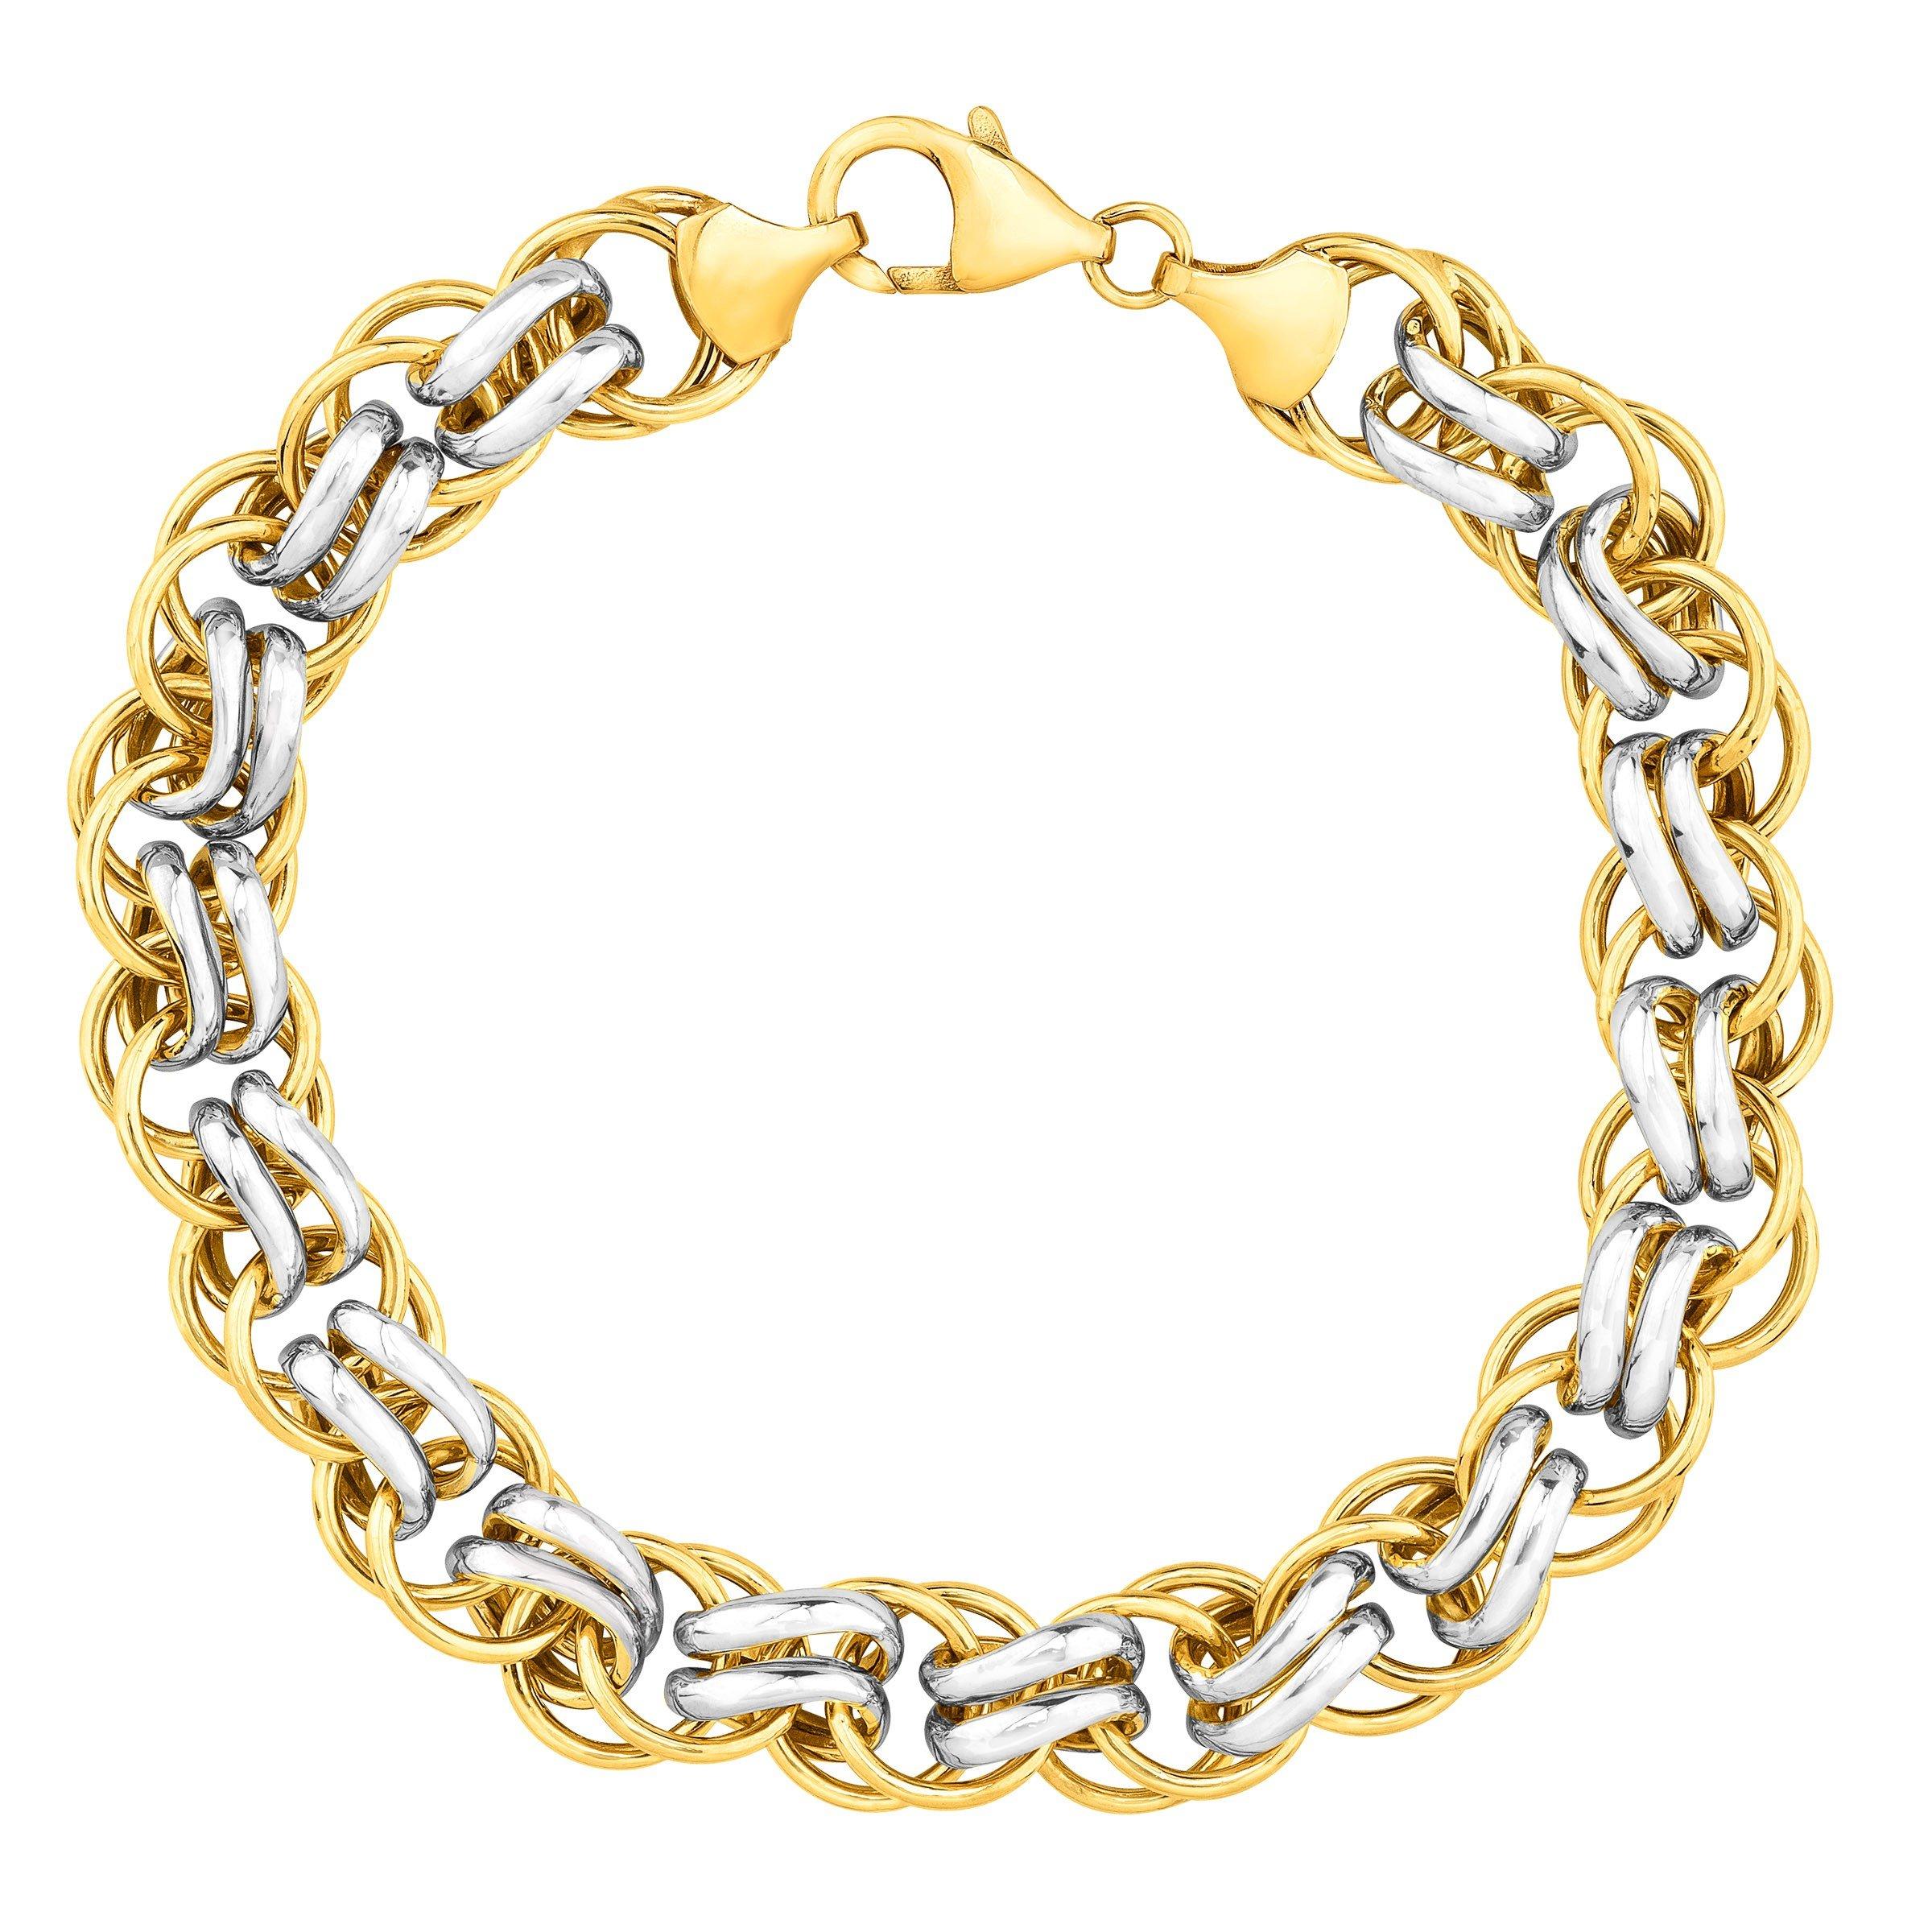 Double-Link Bracelet in 14K Gold-Bonded Sterling Silver, 7.5''